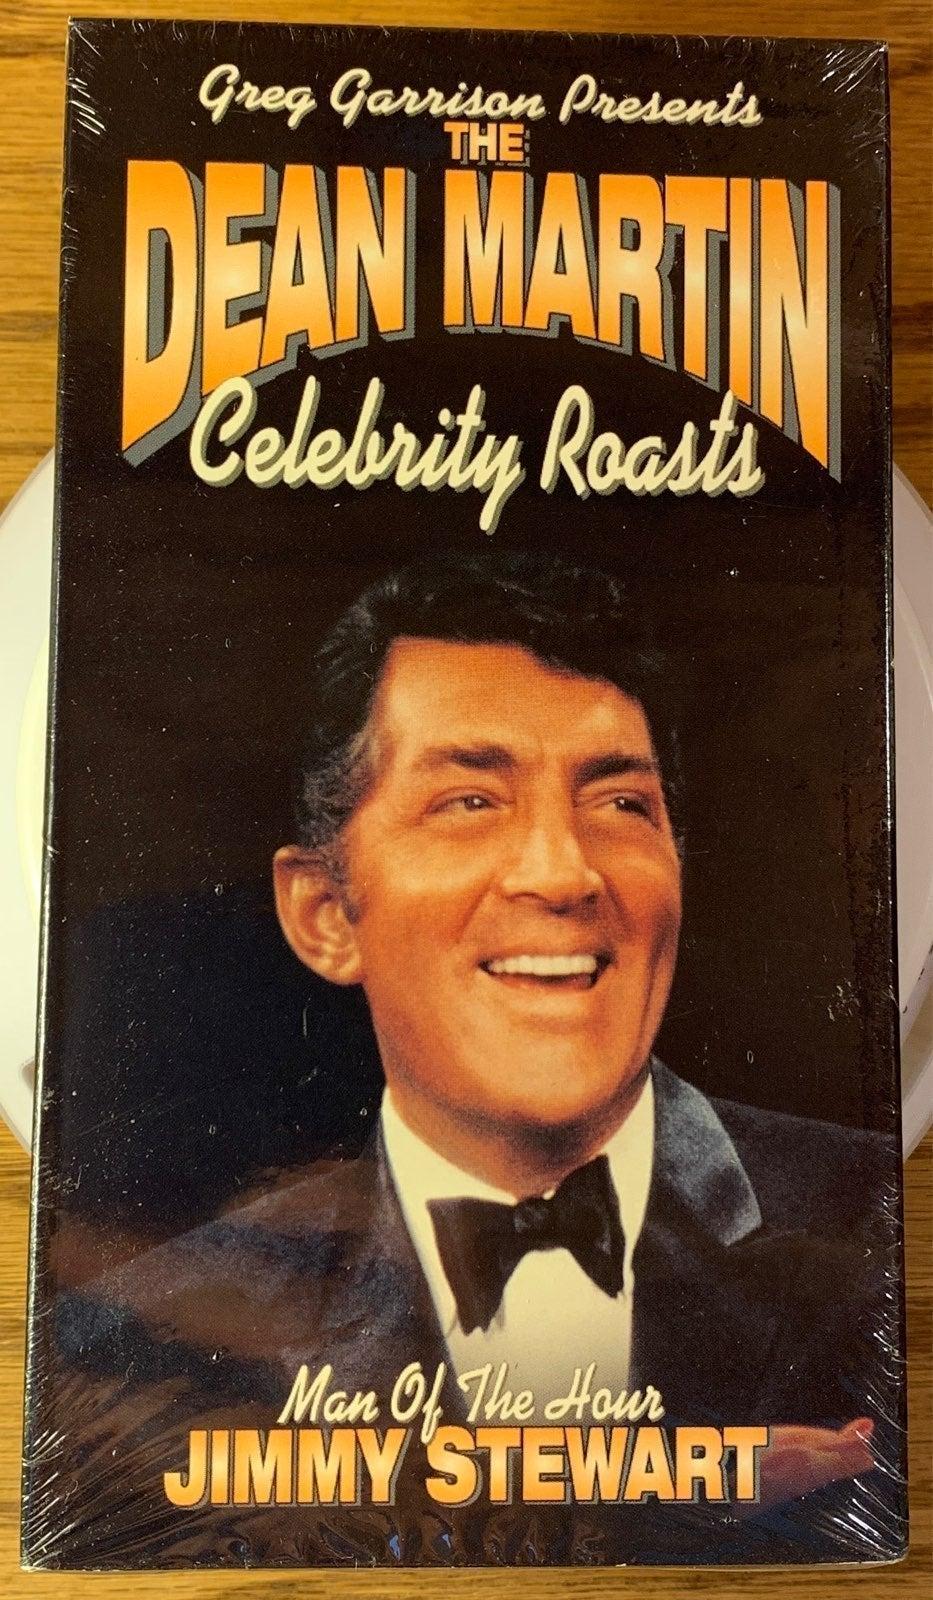 The Dean Martin Celebrity Roasts VHS